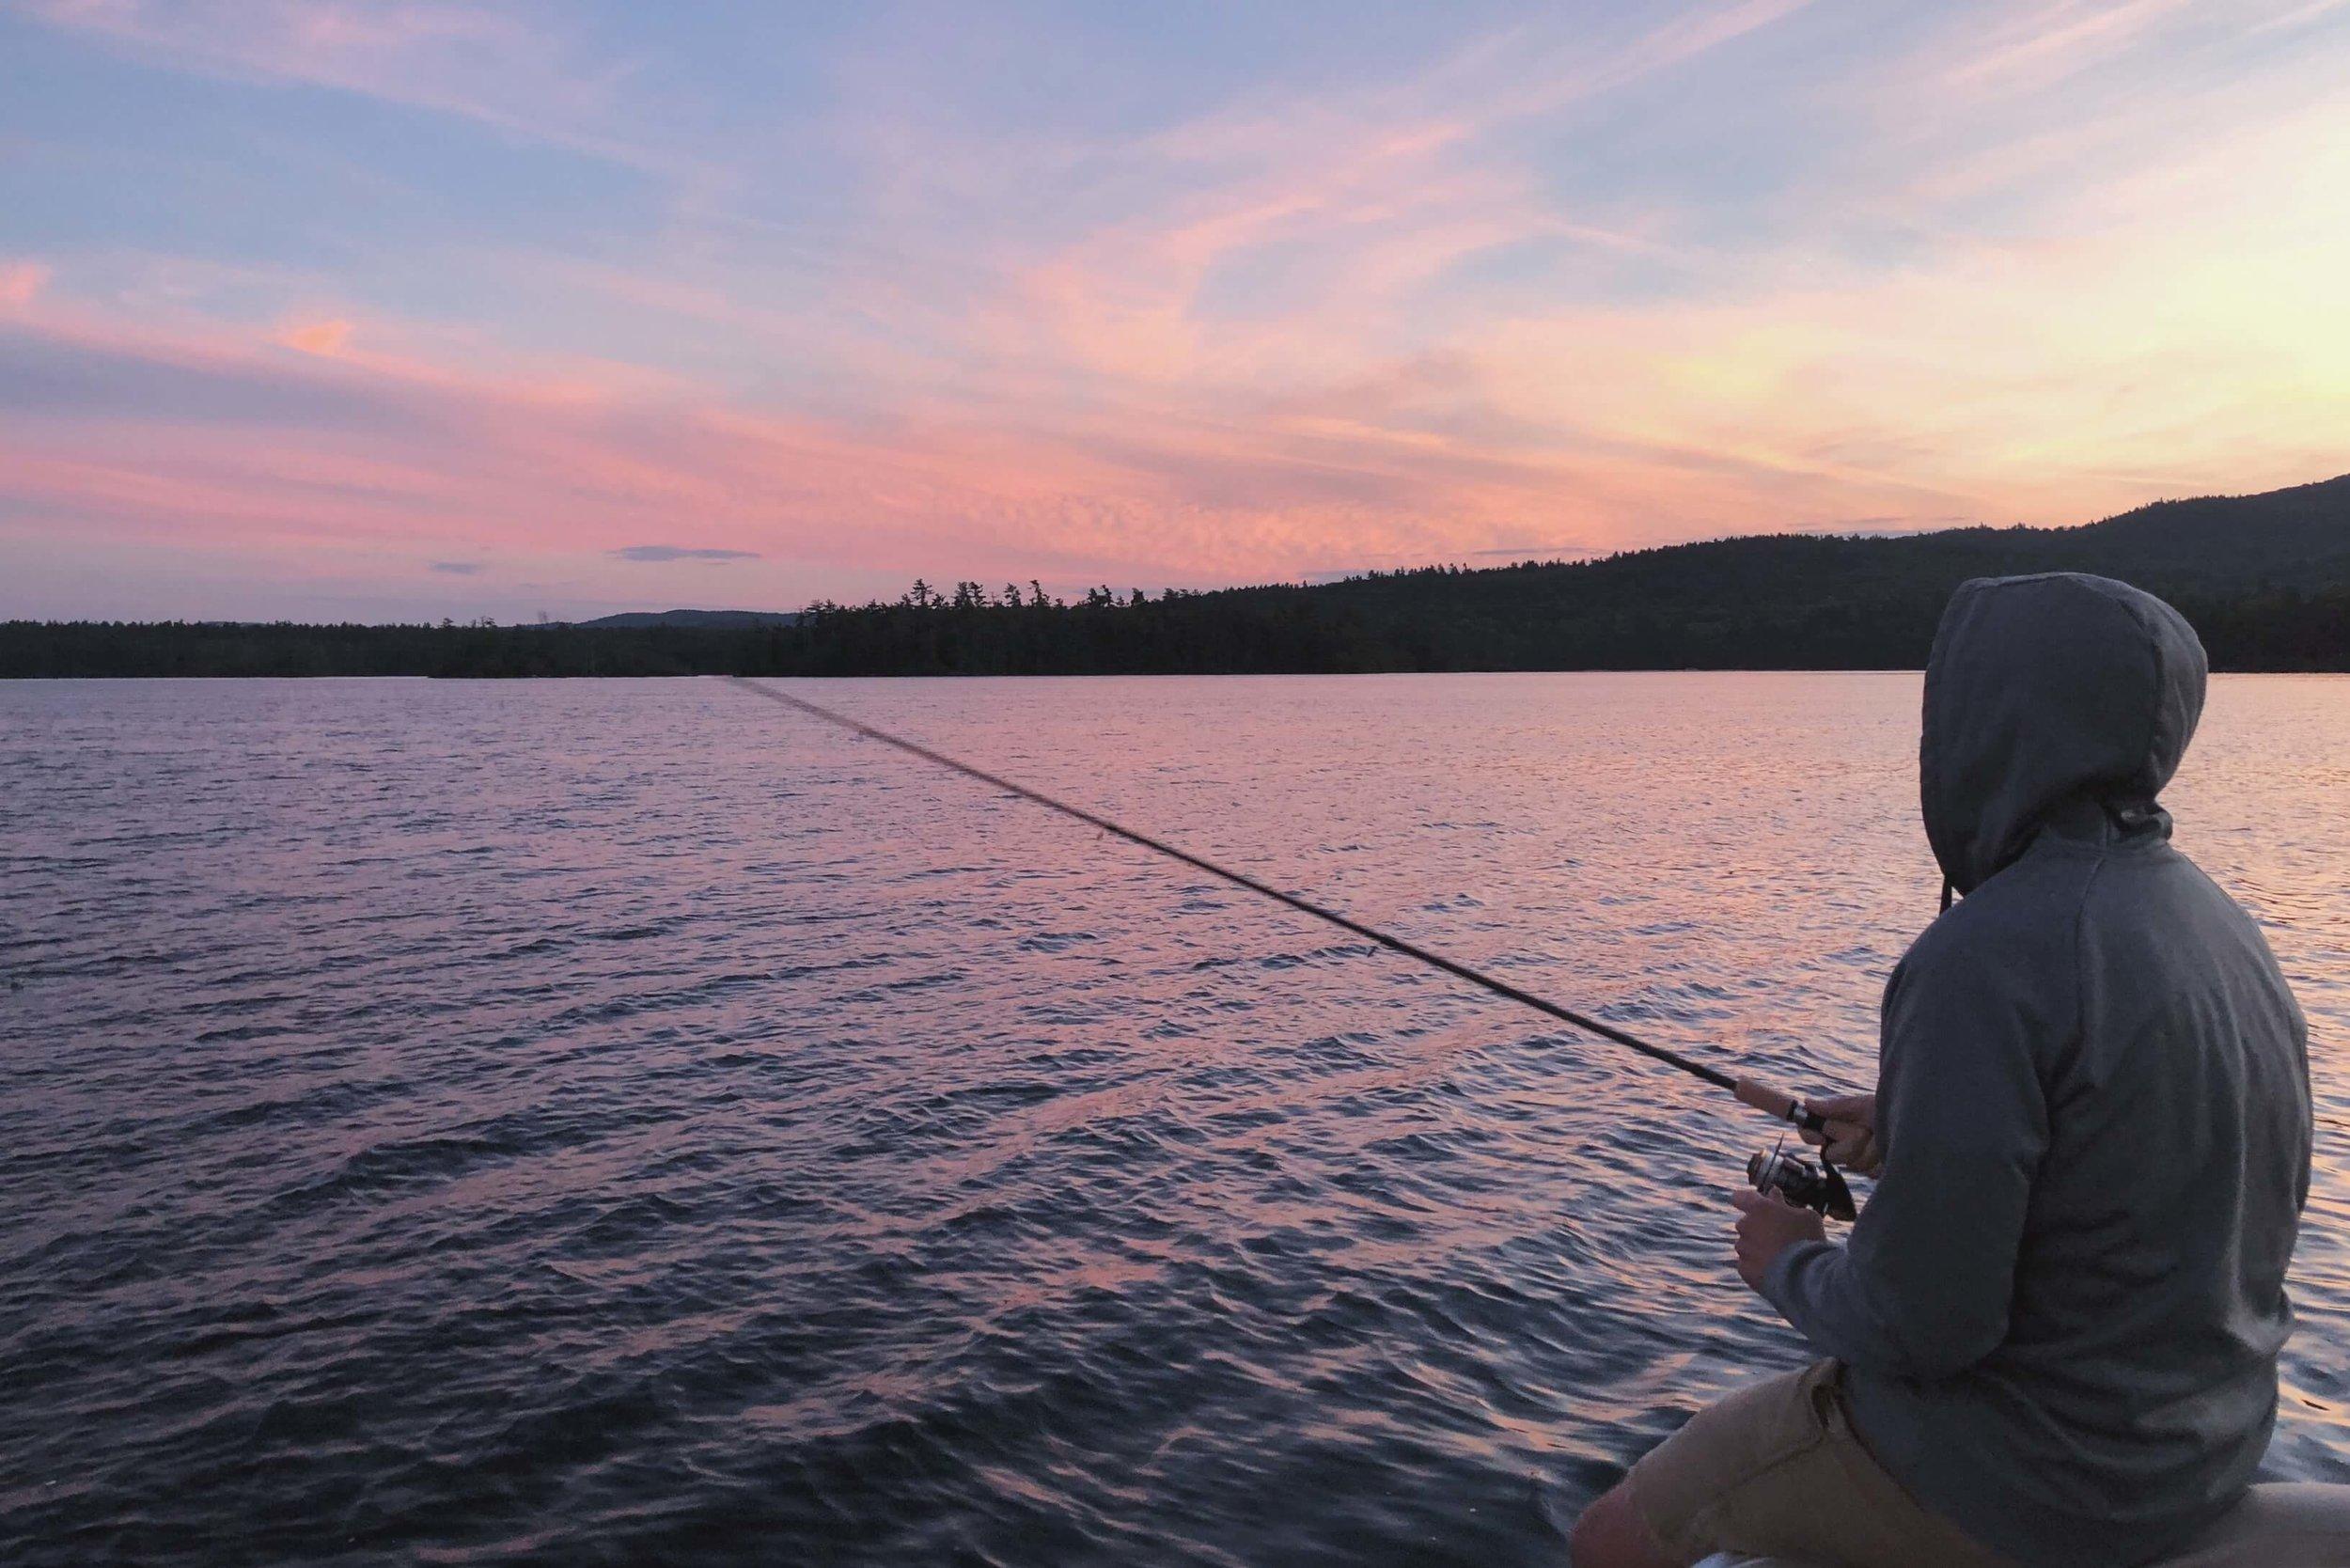 Fishing at sunset on Little Squam